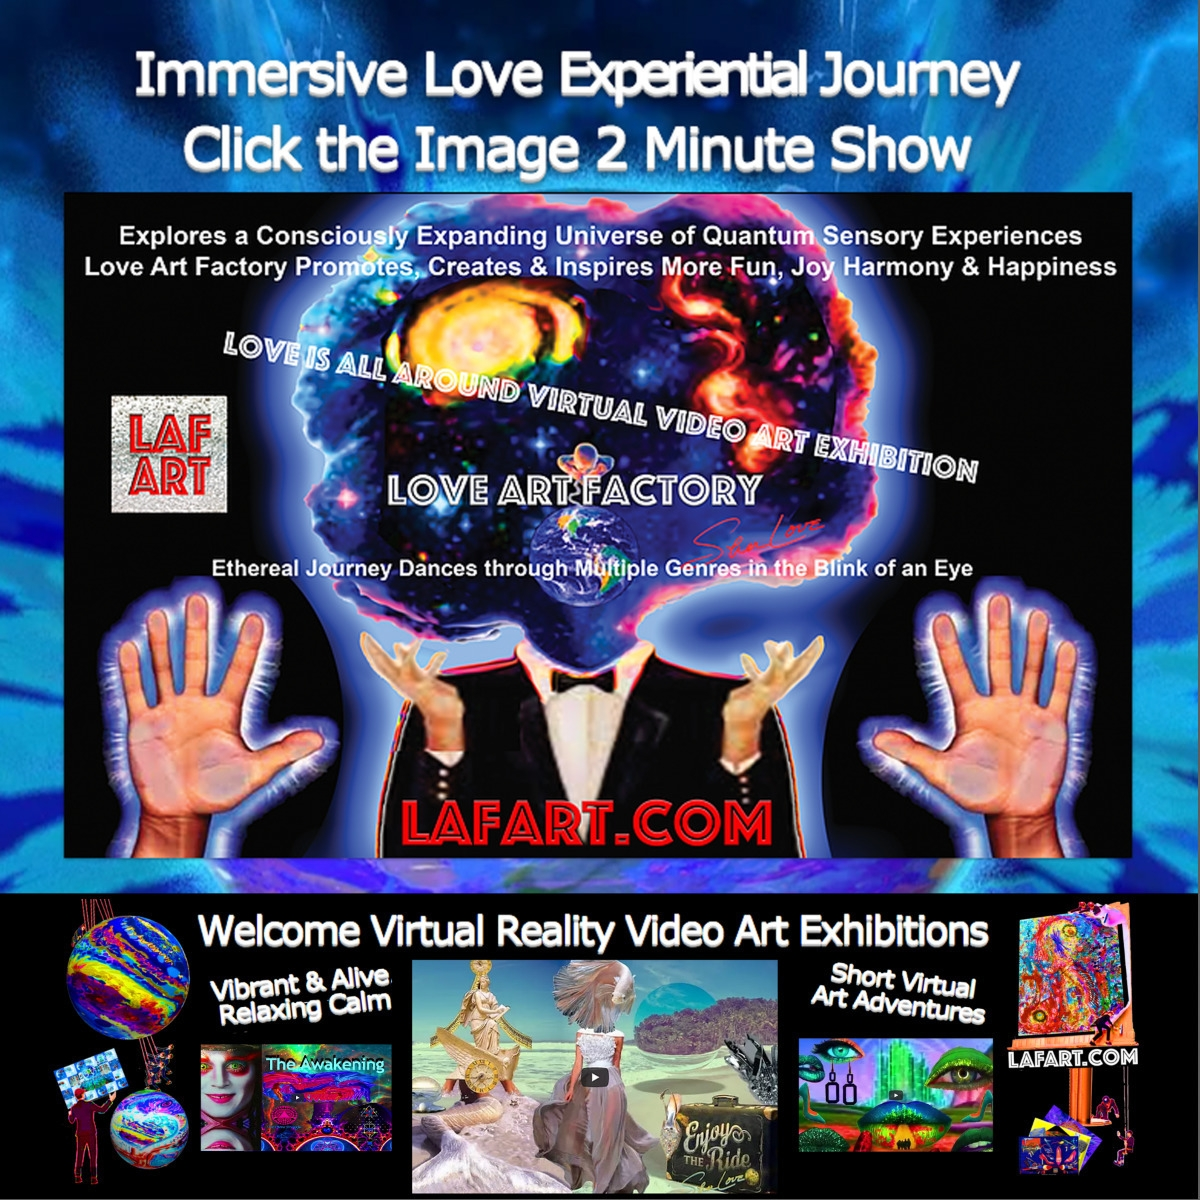 Virtual Art Exhibition 2 Minute - loveartfactory | ello